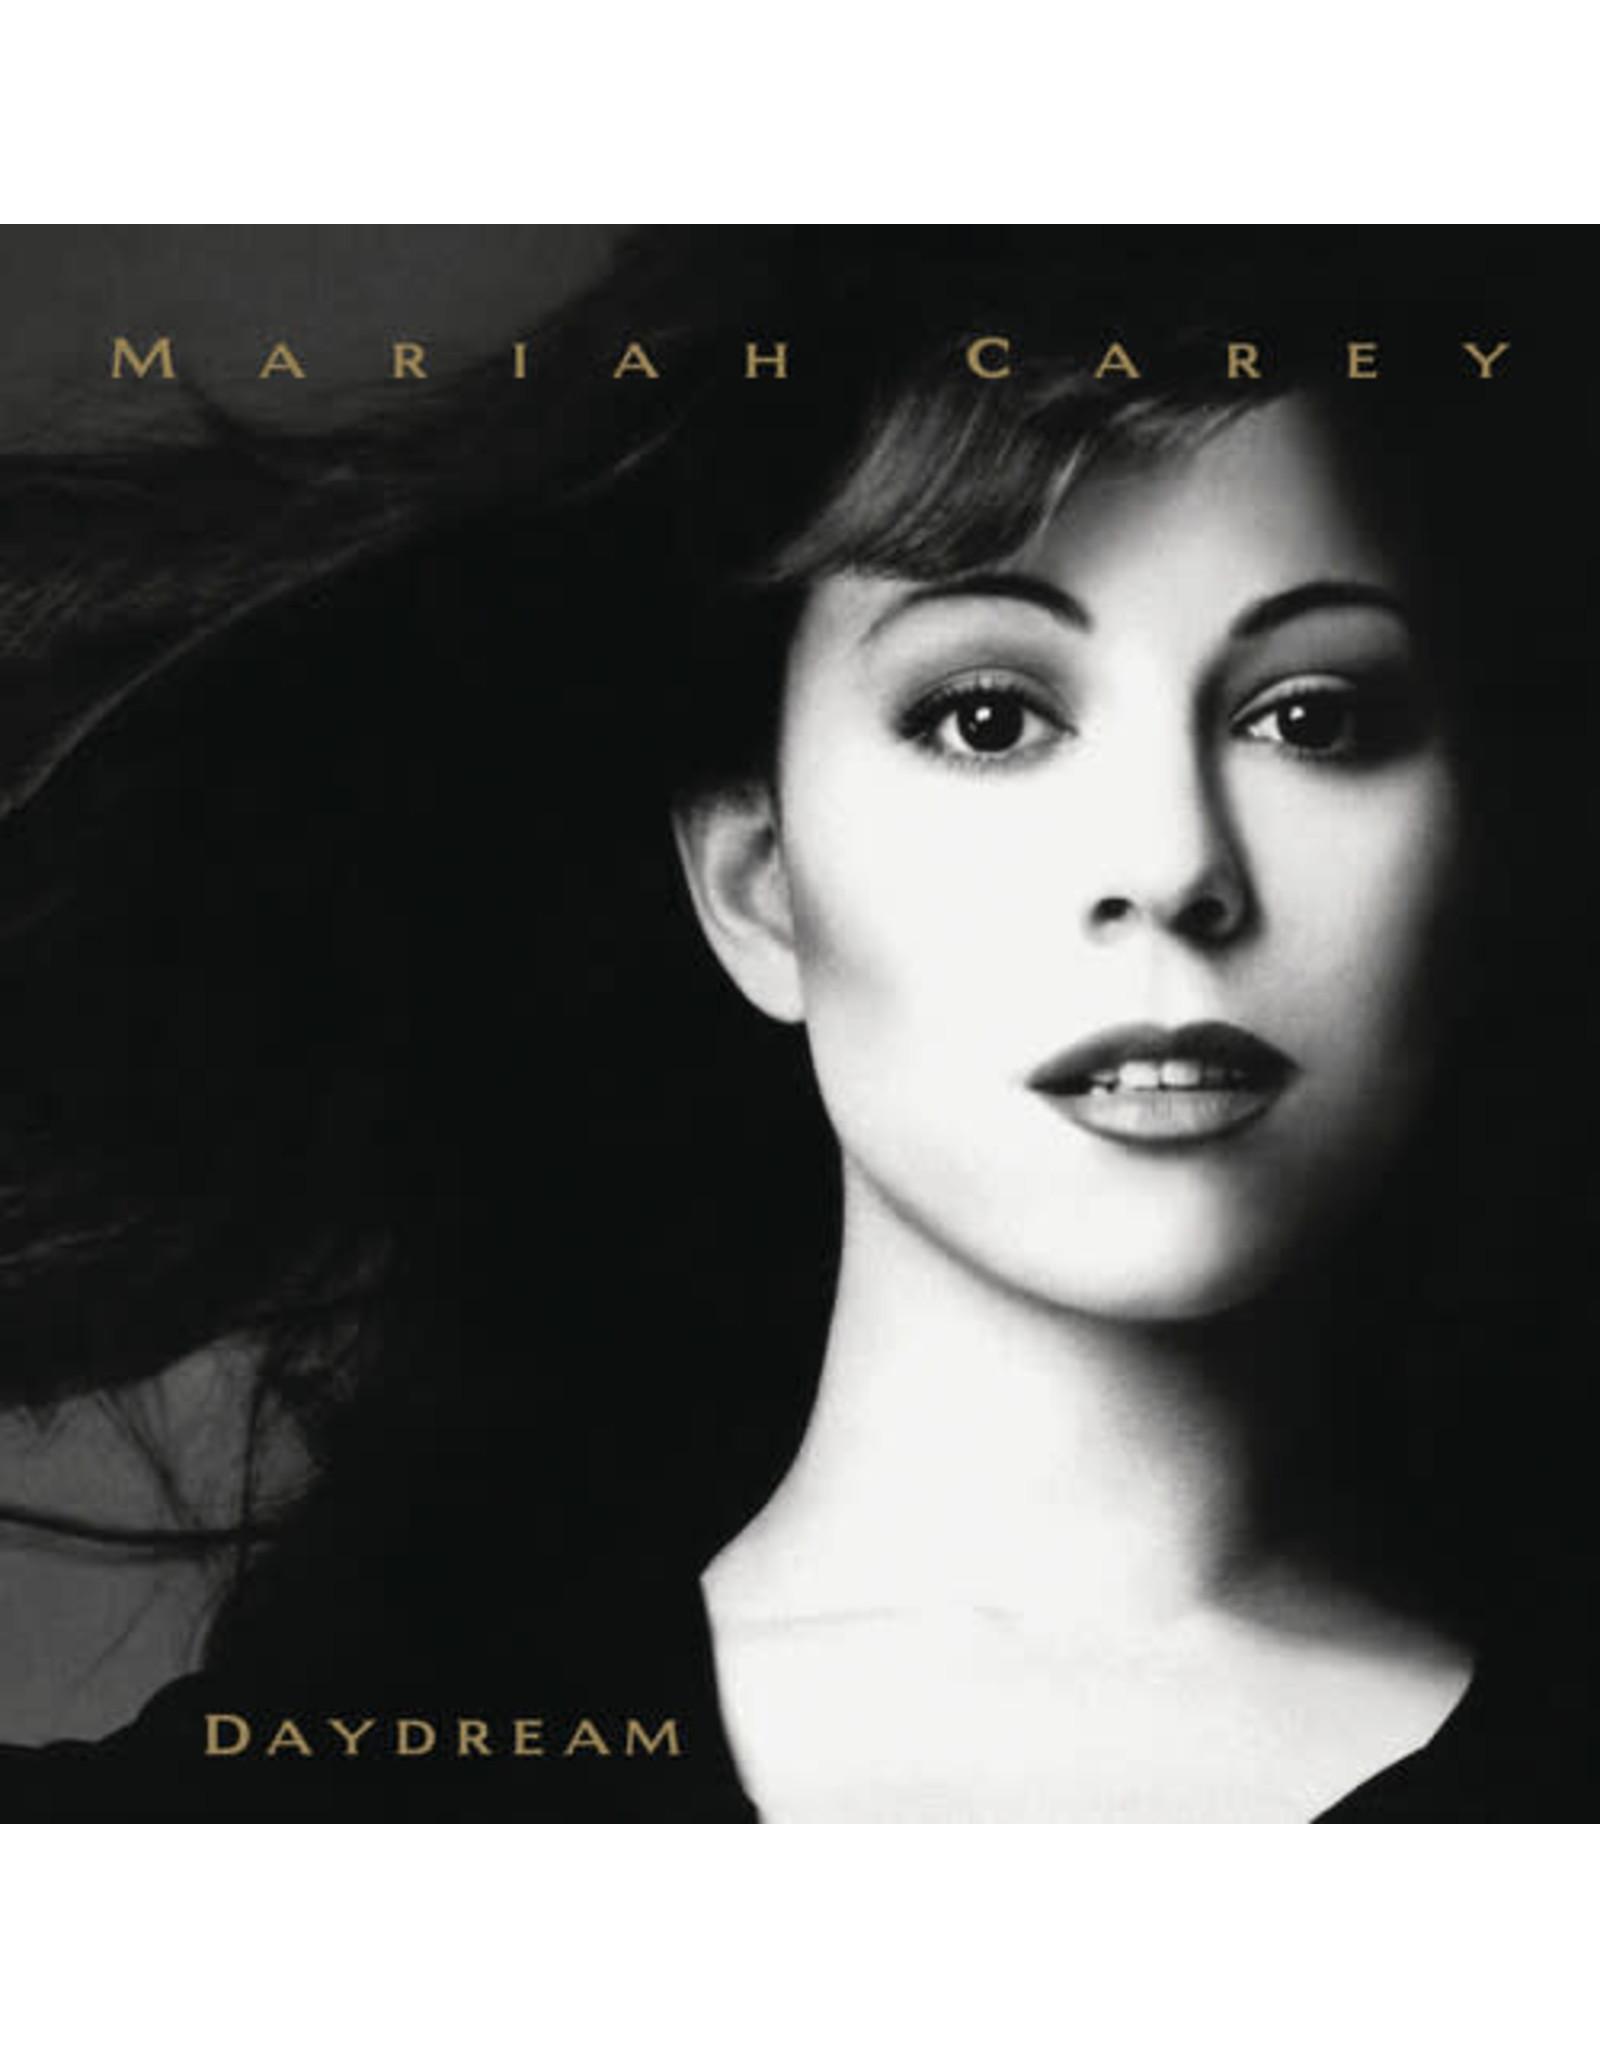 New Vinyl Mariah Carey - Daydream LP